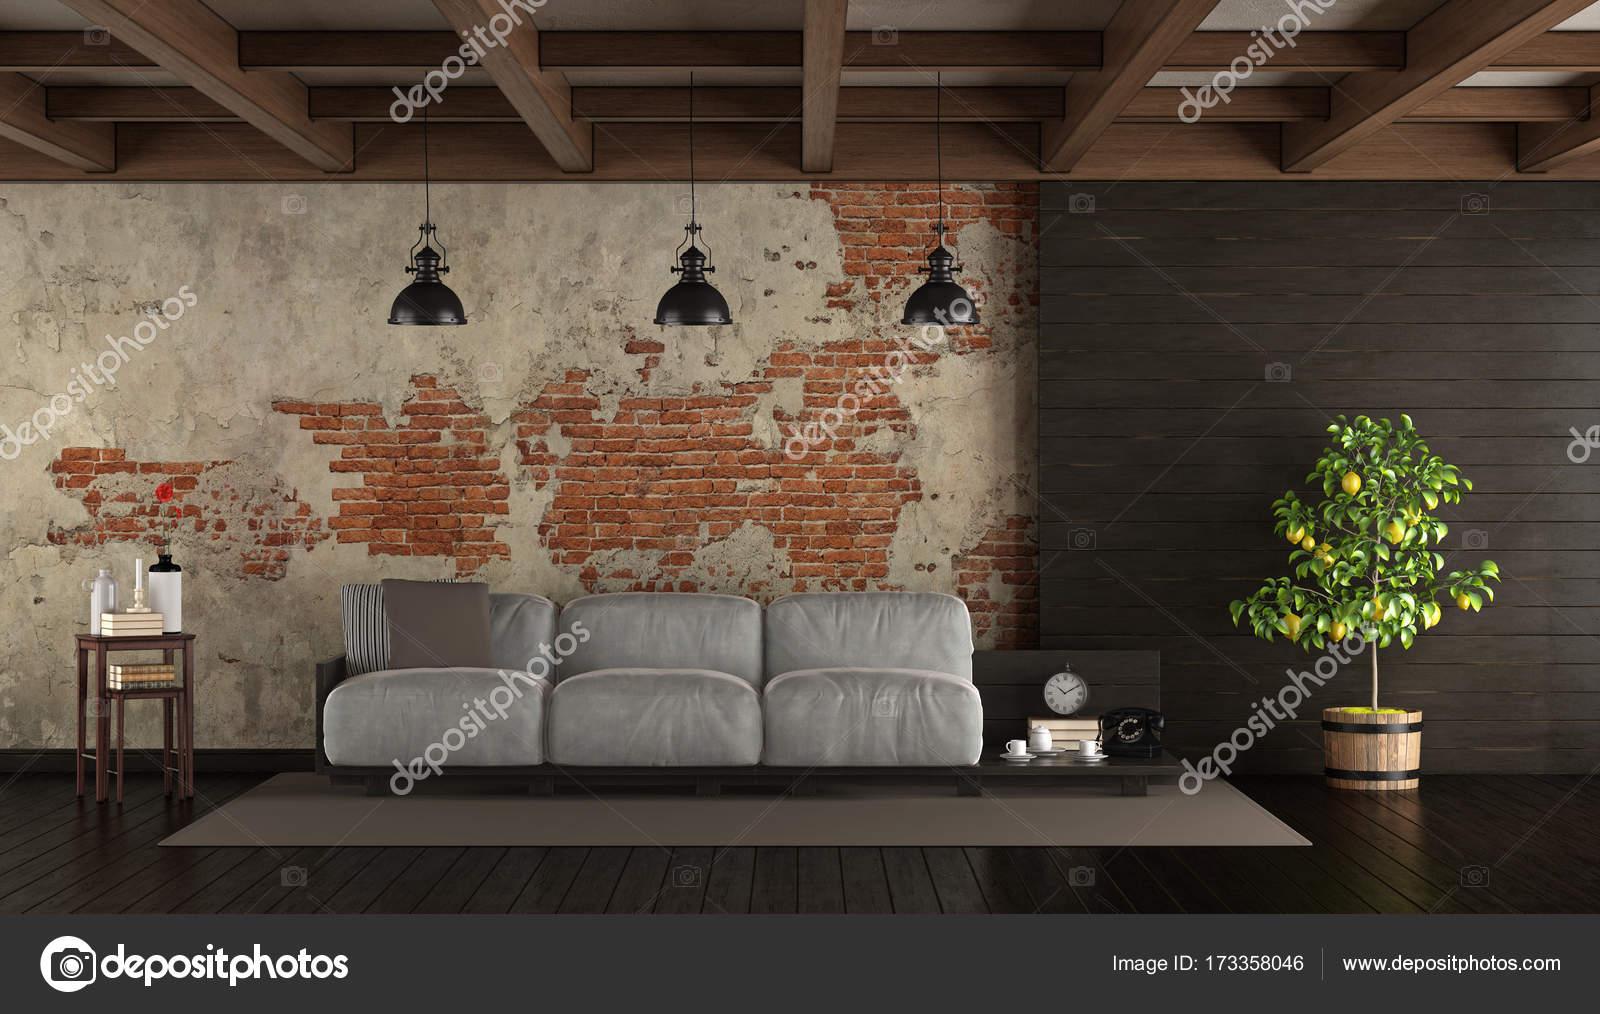 donkere woonkamer in rustieke stijl met pallet bank muur en houten lambrisering 3d rendering foto van archideaphoto